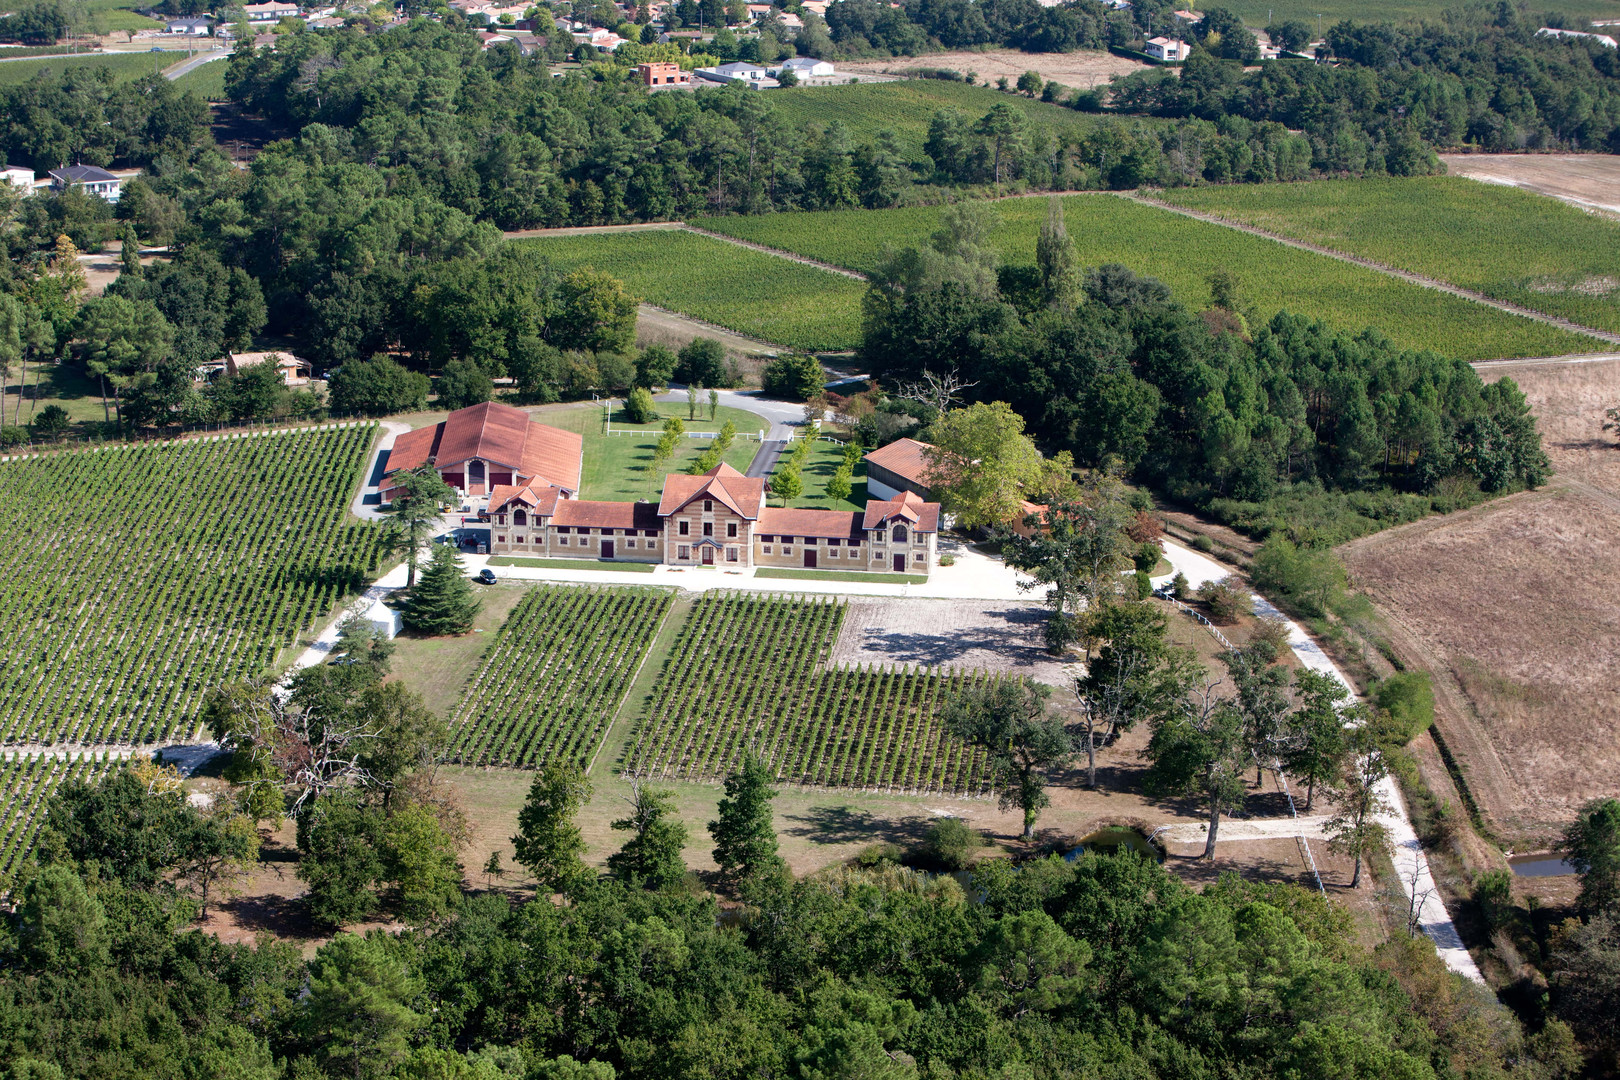 Chateau le Sartre Drone